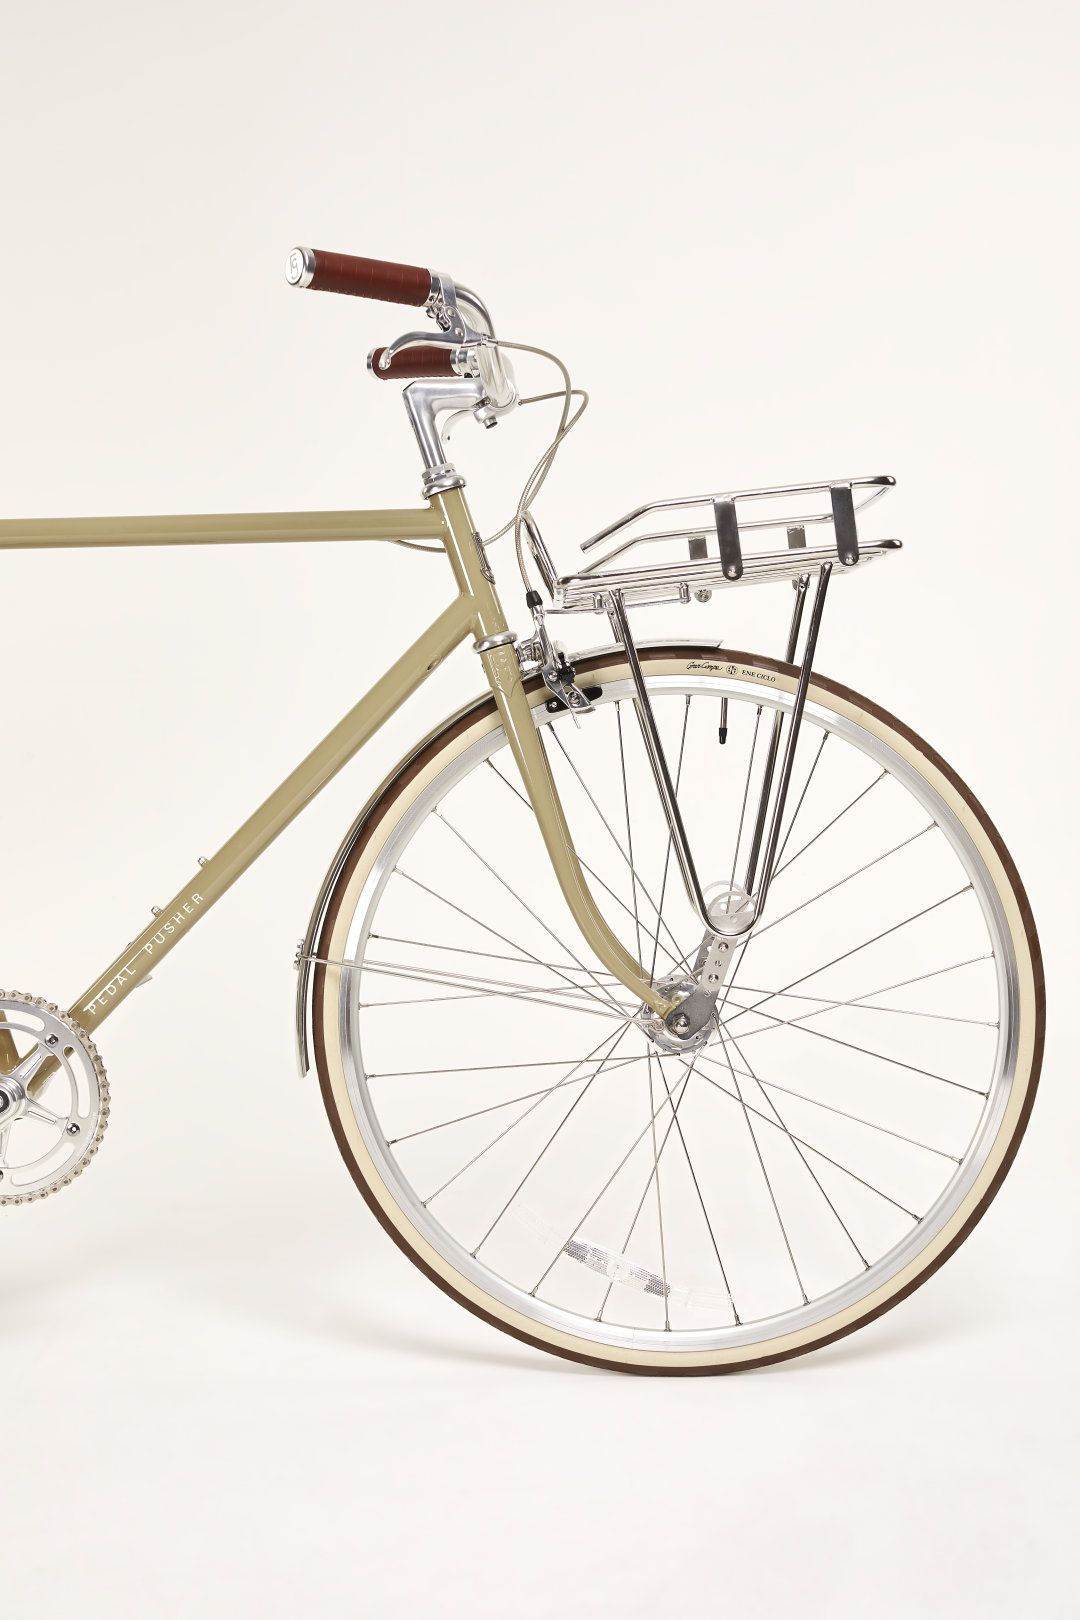 Closed X Freddie Grubb Bike Freddie Grubb Bike Vintage Bicycles